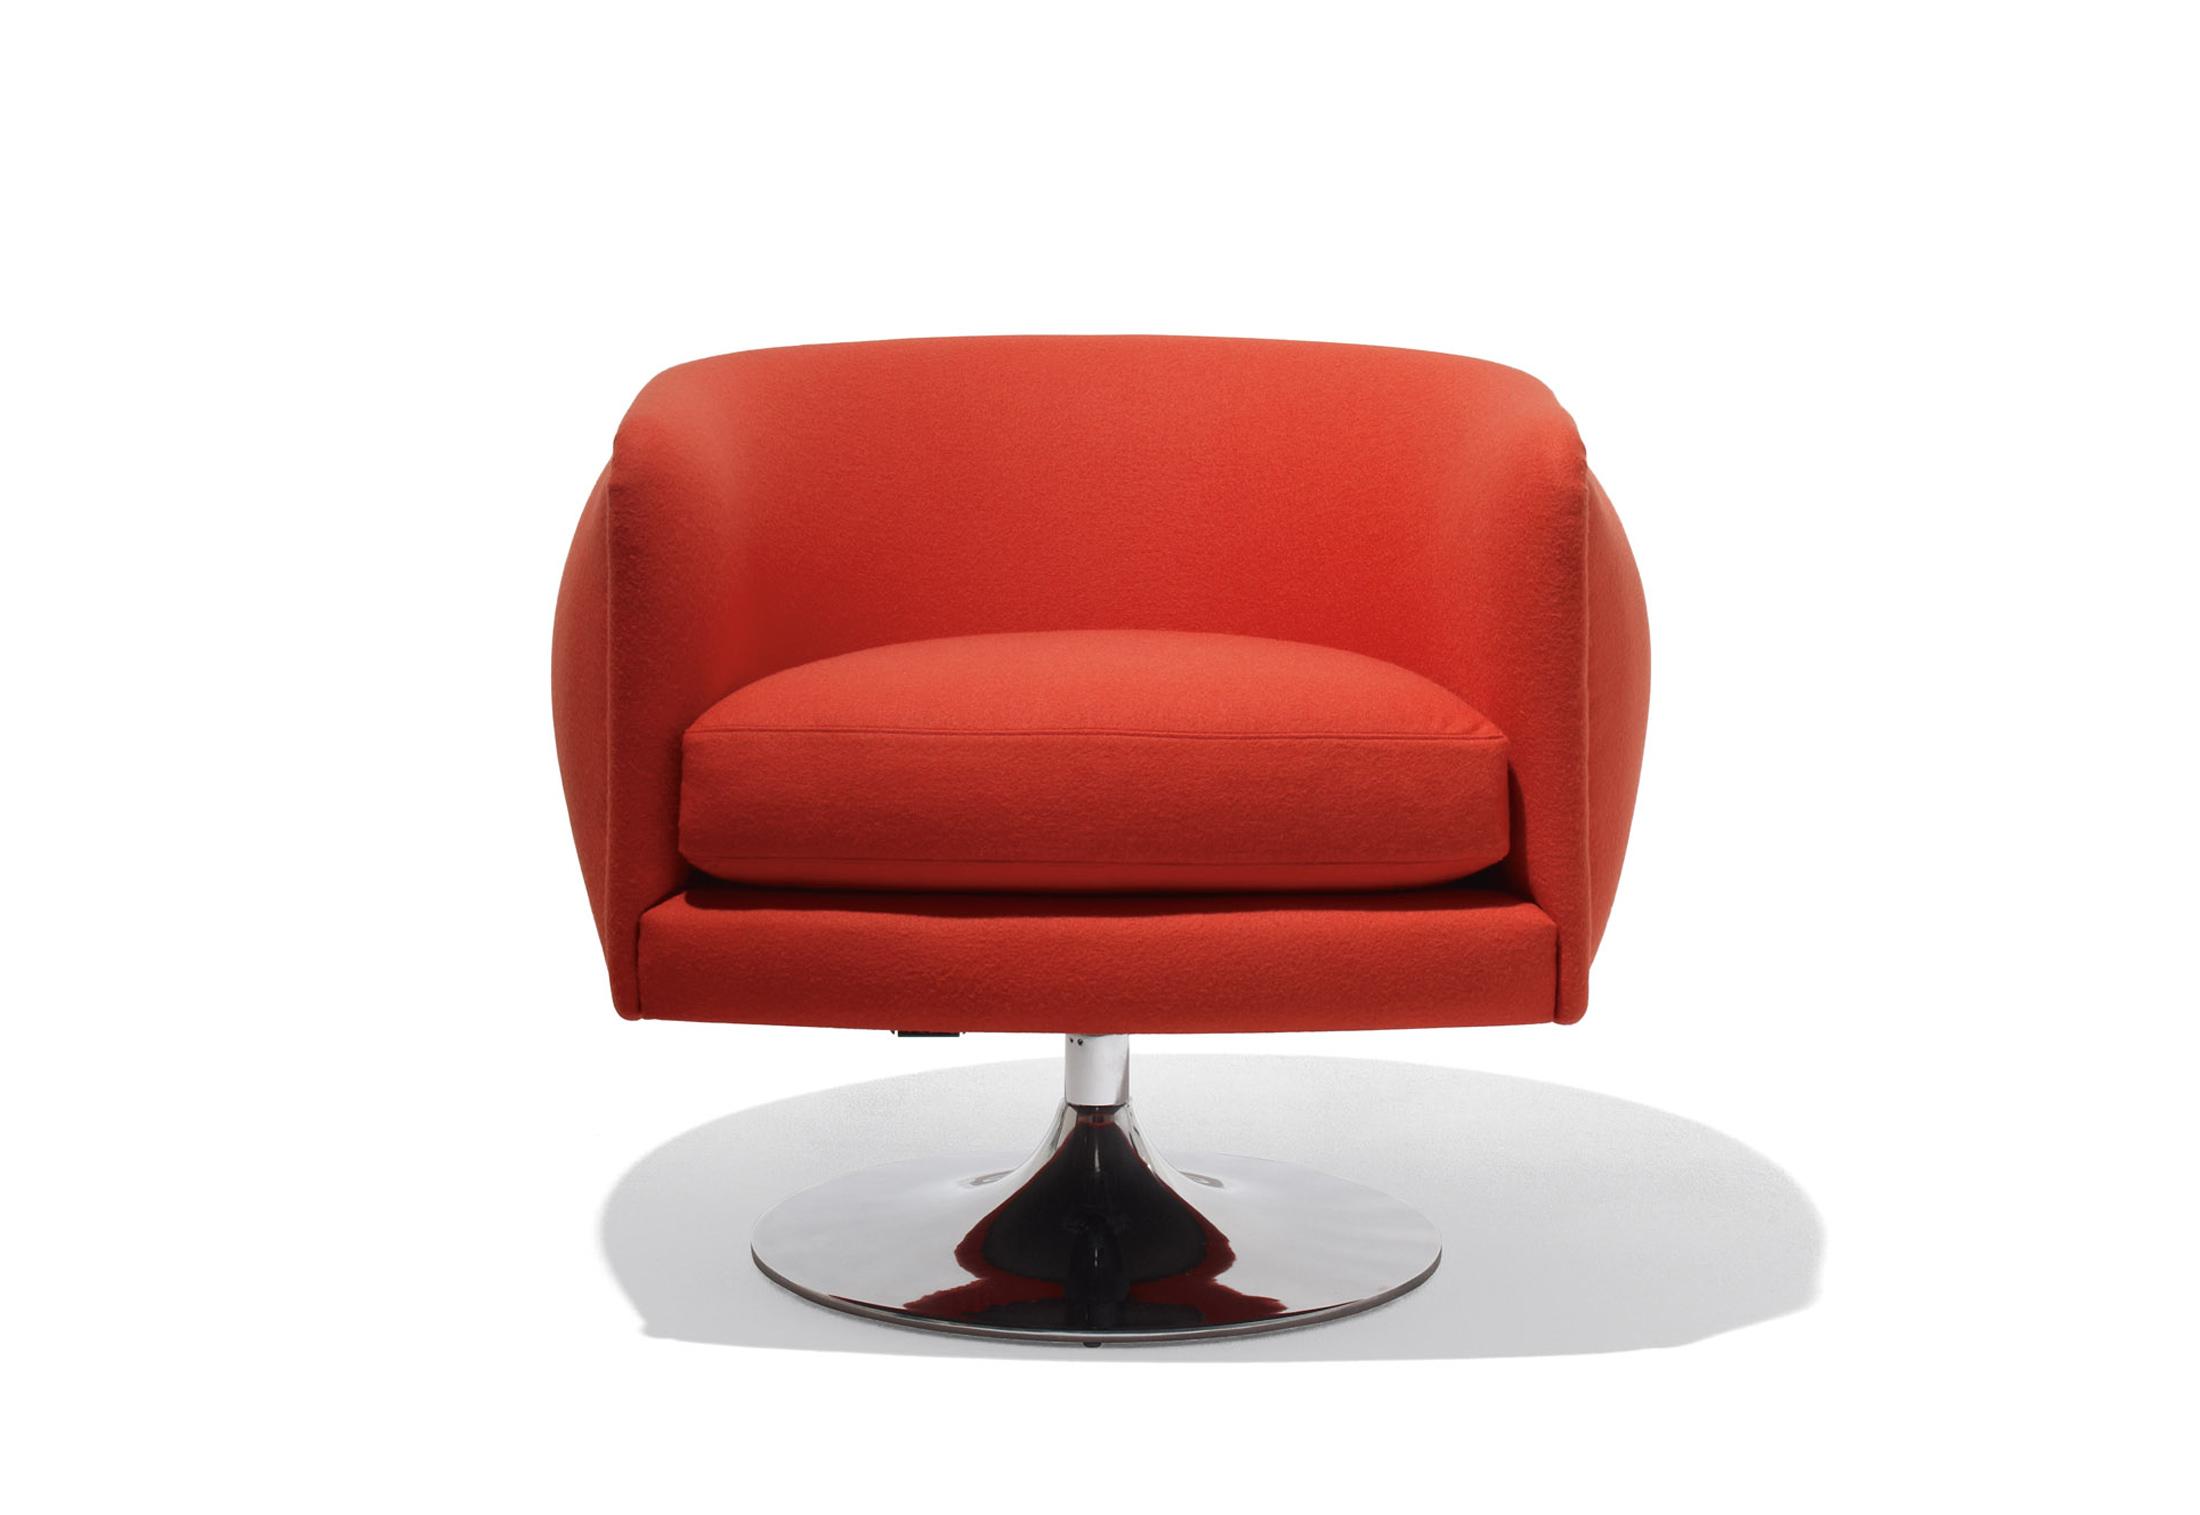 D Urso Swivel Lounge Chair By Knoll Stylepark